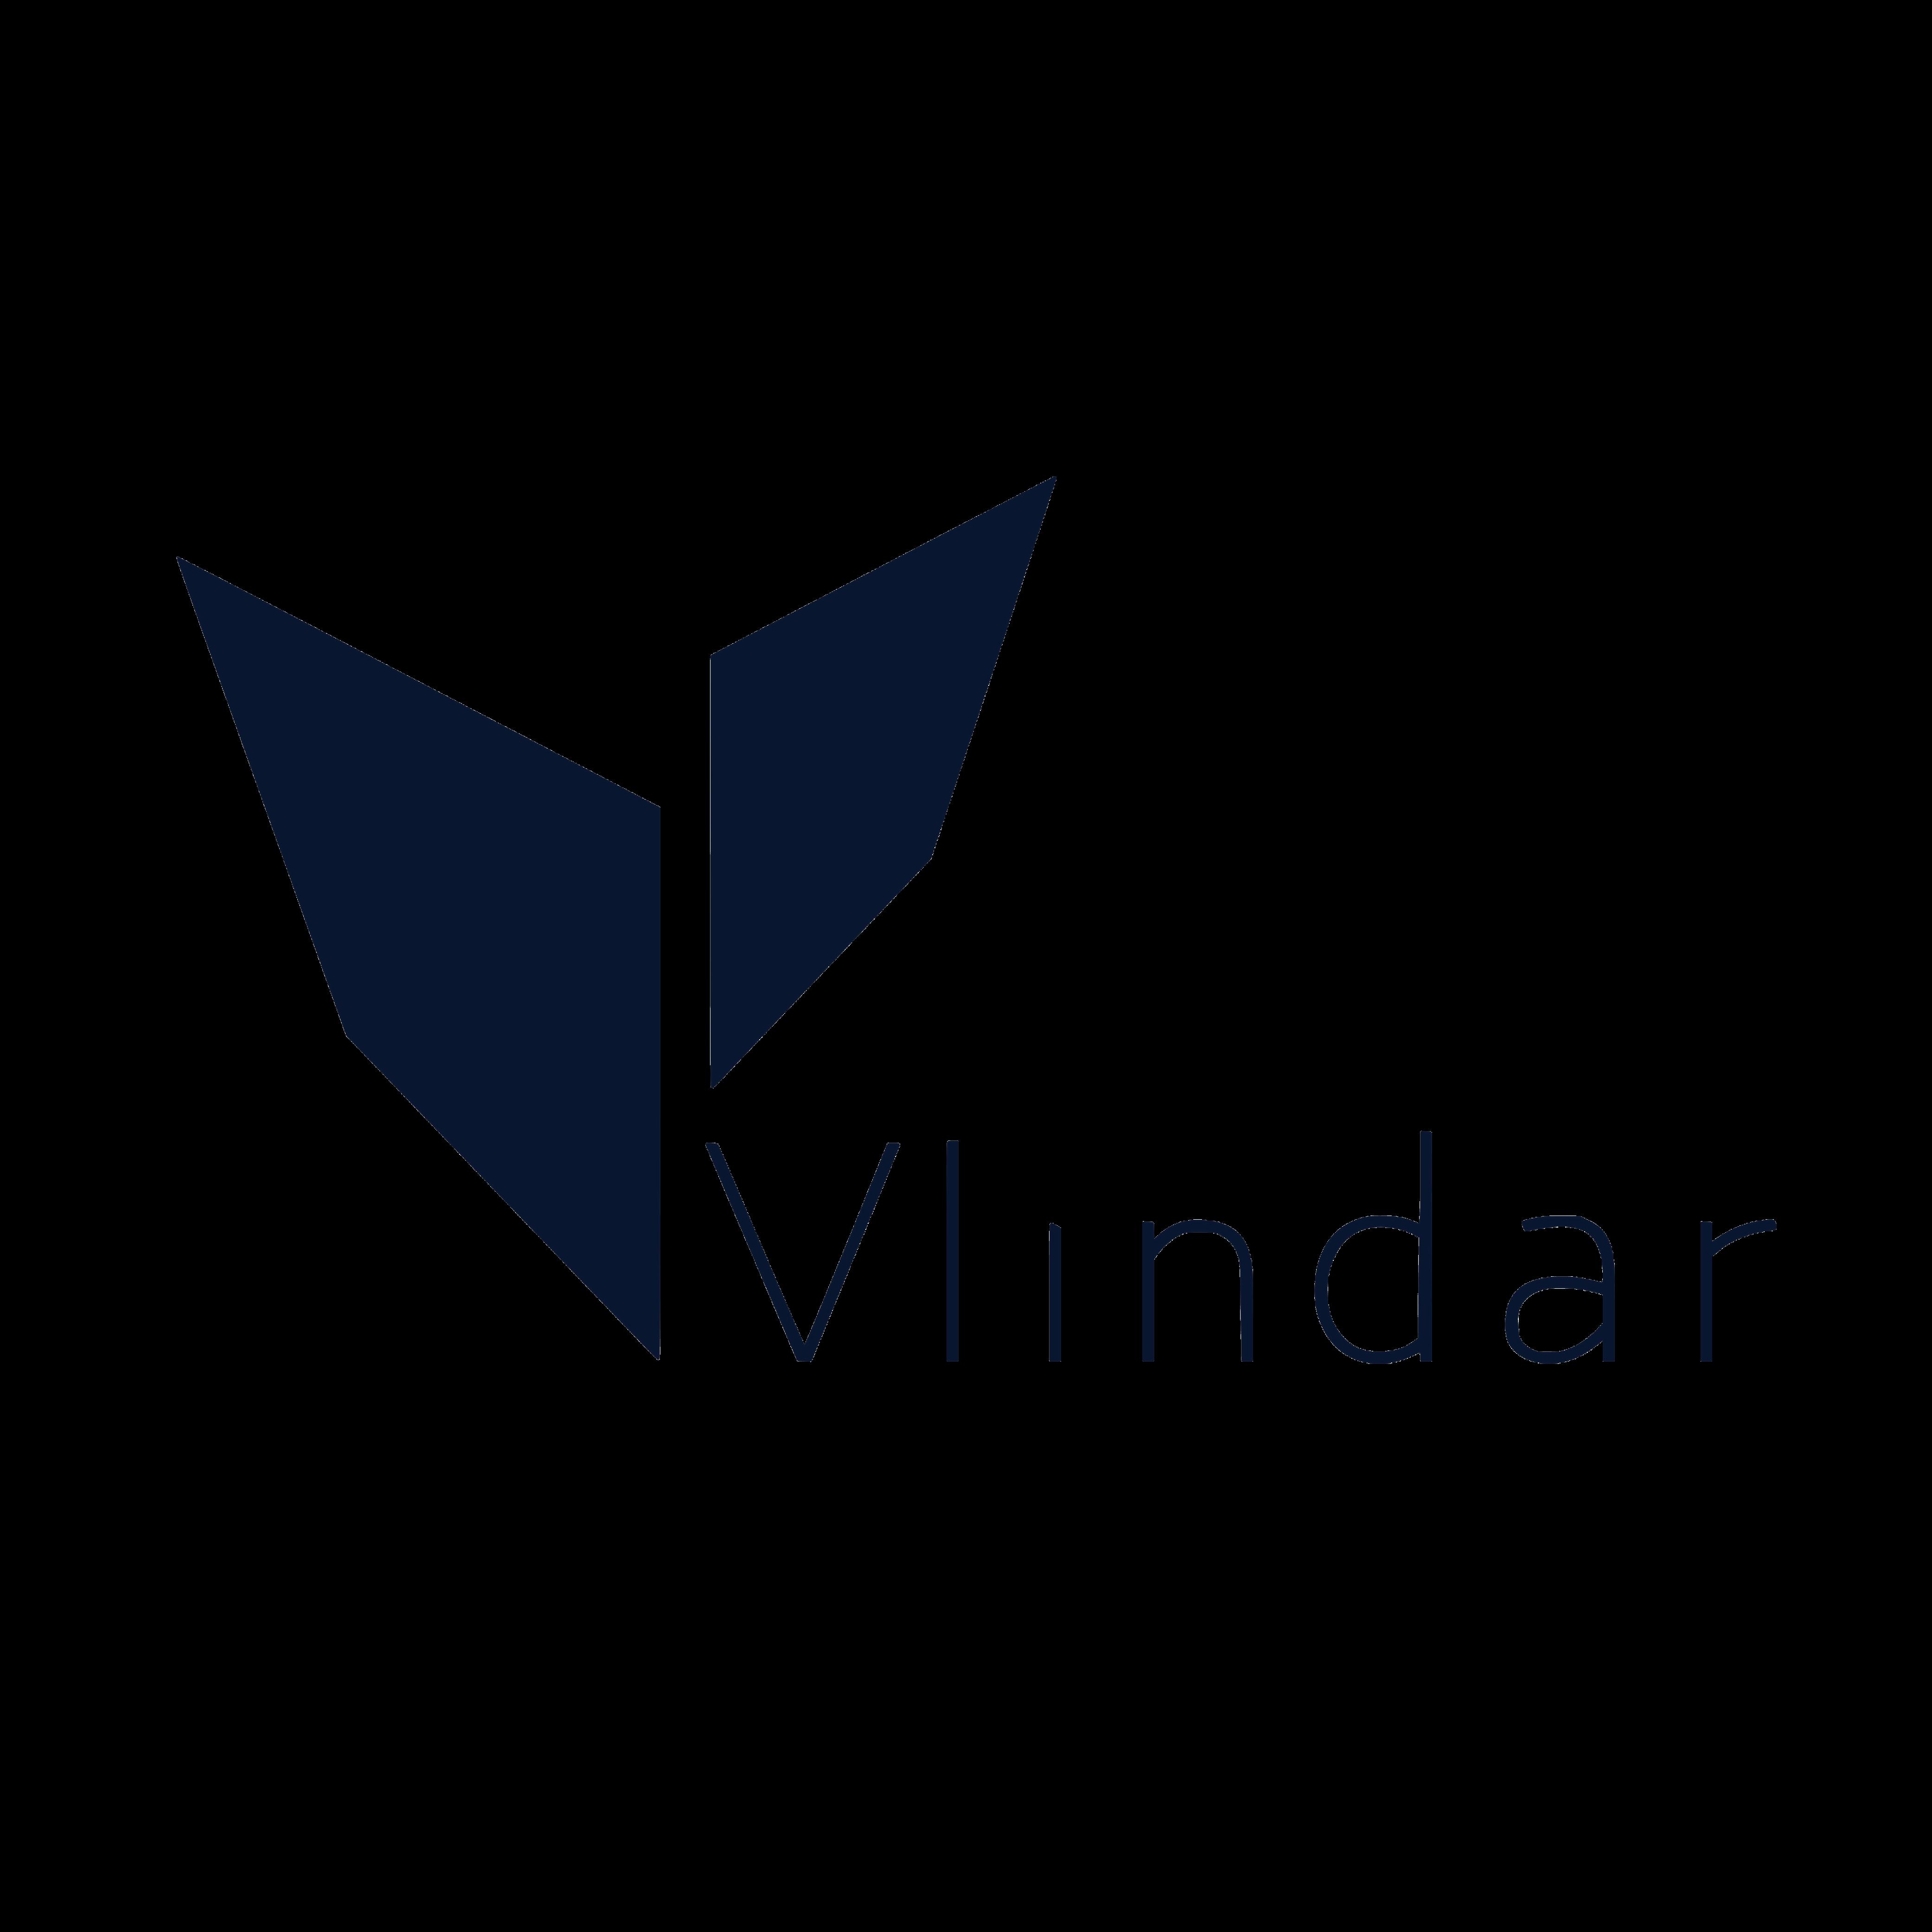 Vlindar logo